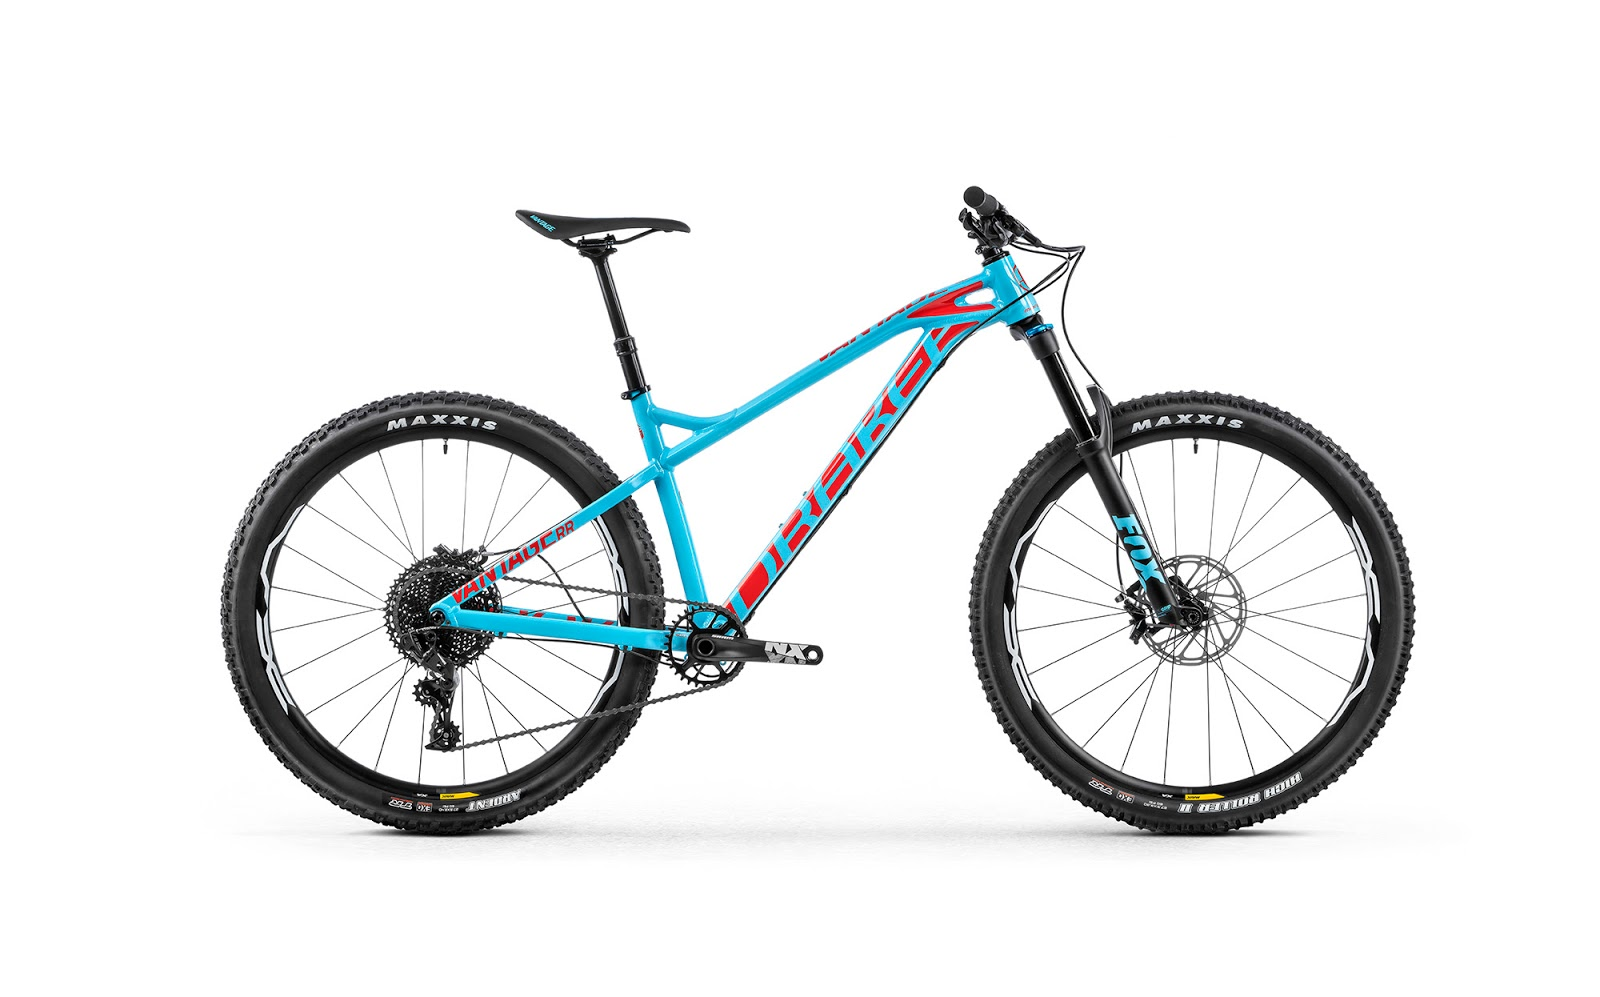 Mondraker S New Vantage Mtb Bikes Range